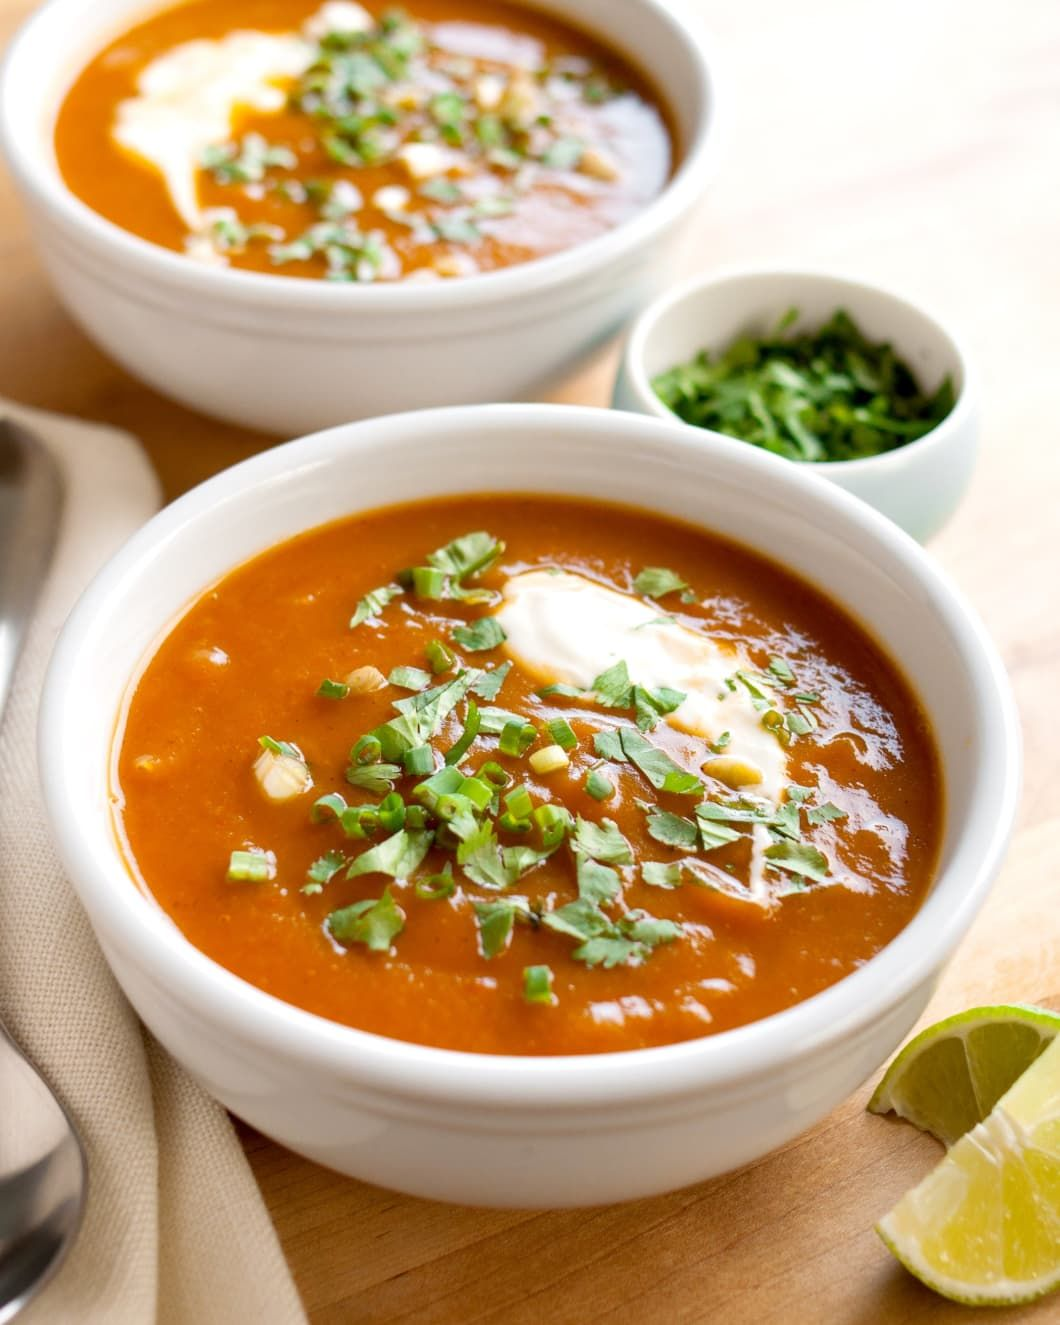 Southwestern Butternut Squash Soup #butternutsquashsoup